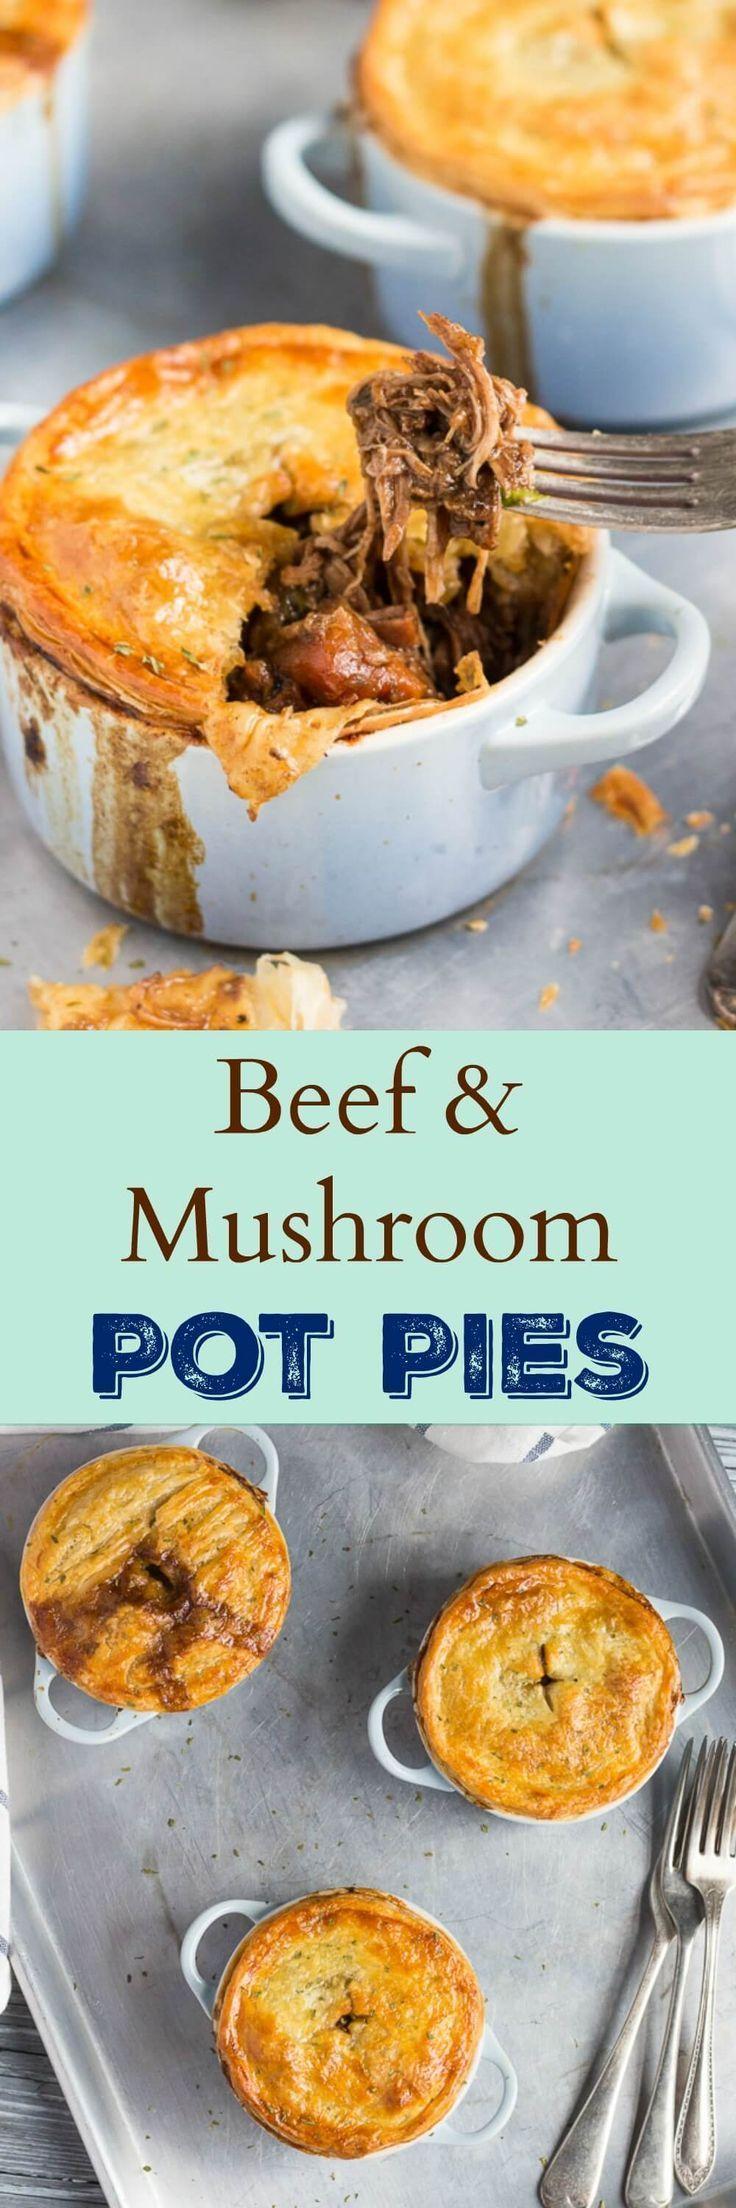 Leftover Beef & Mushroom Stew Pot Pies | Recipe | Food ...